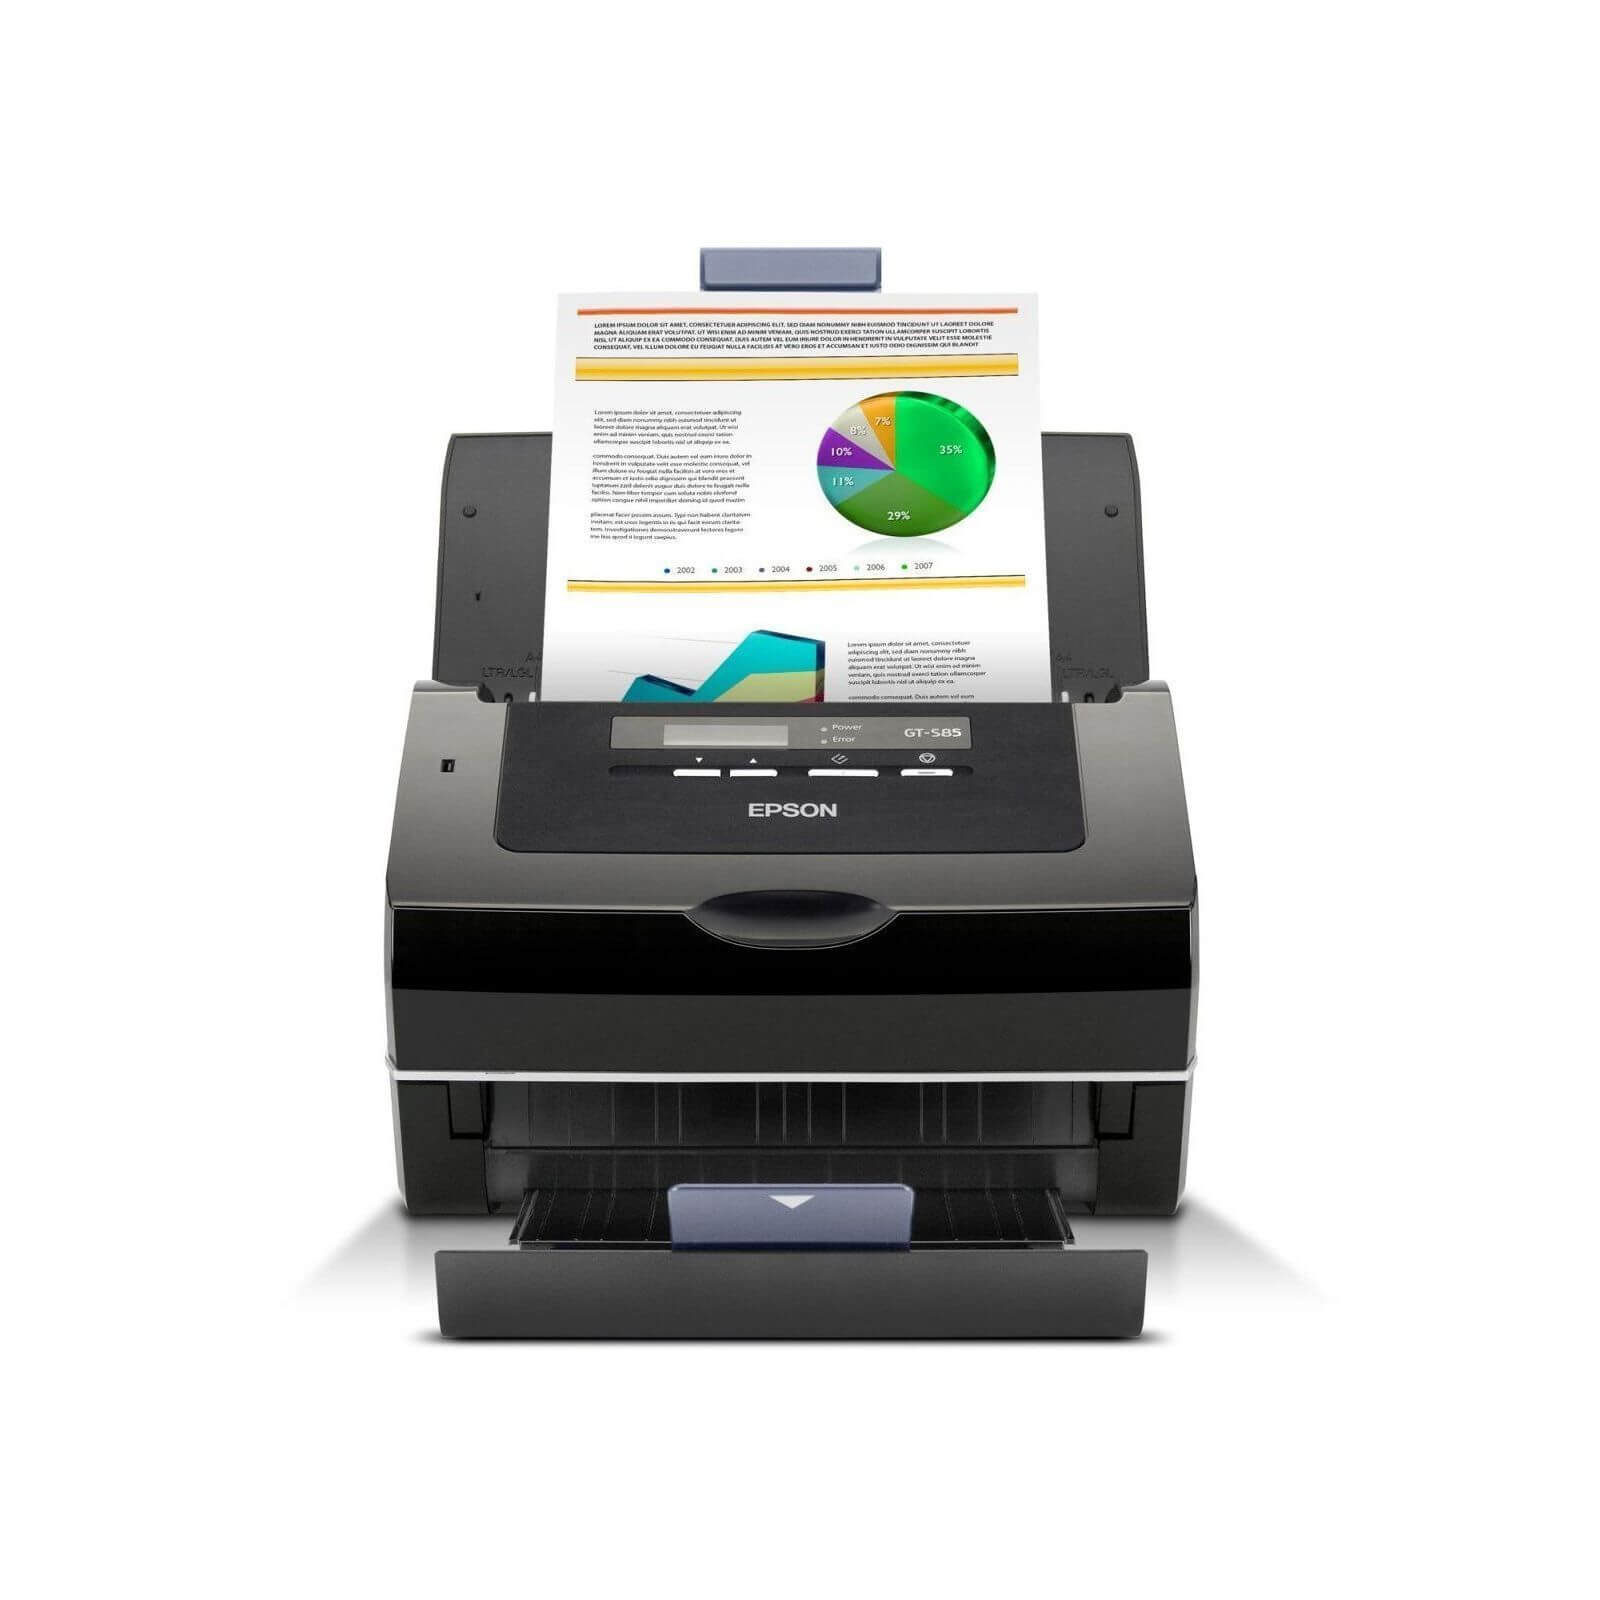 Scanner Profissional Epson GT - S85 Workforce Pro